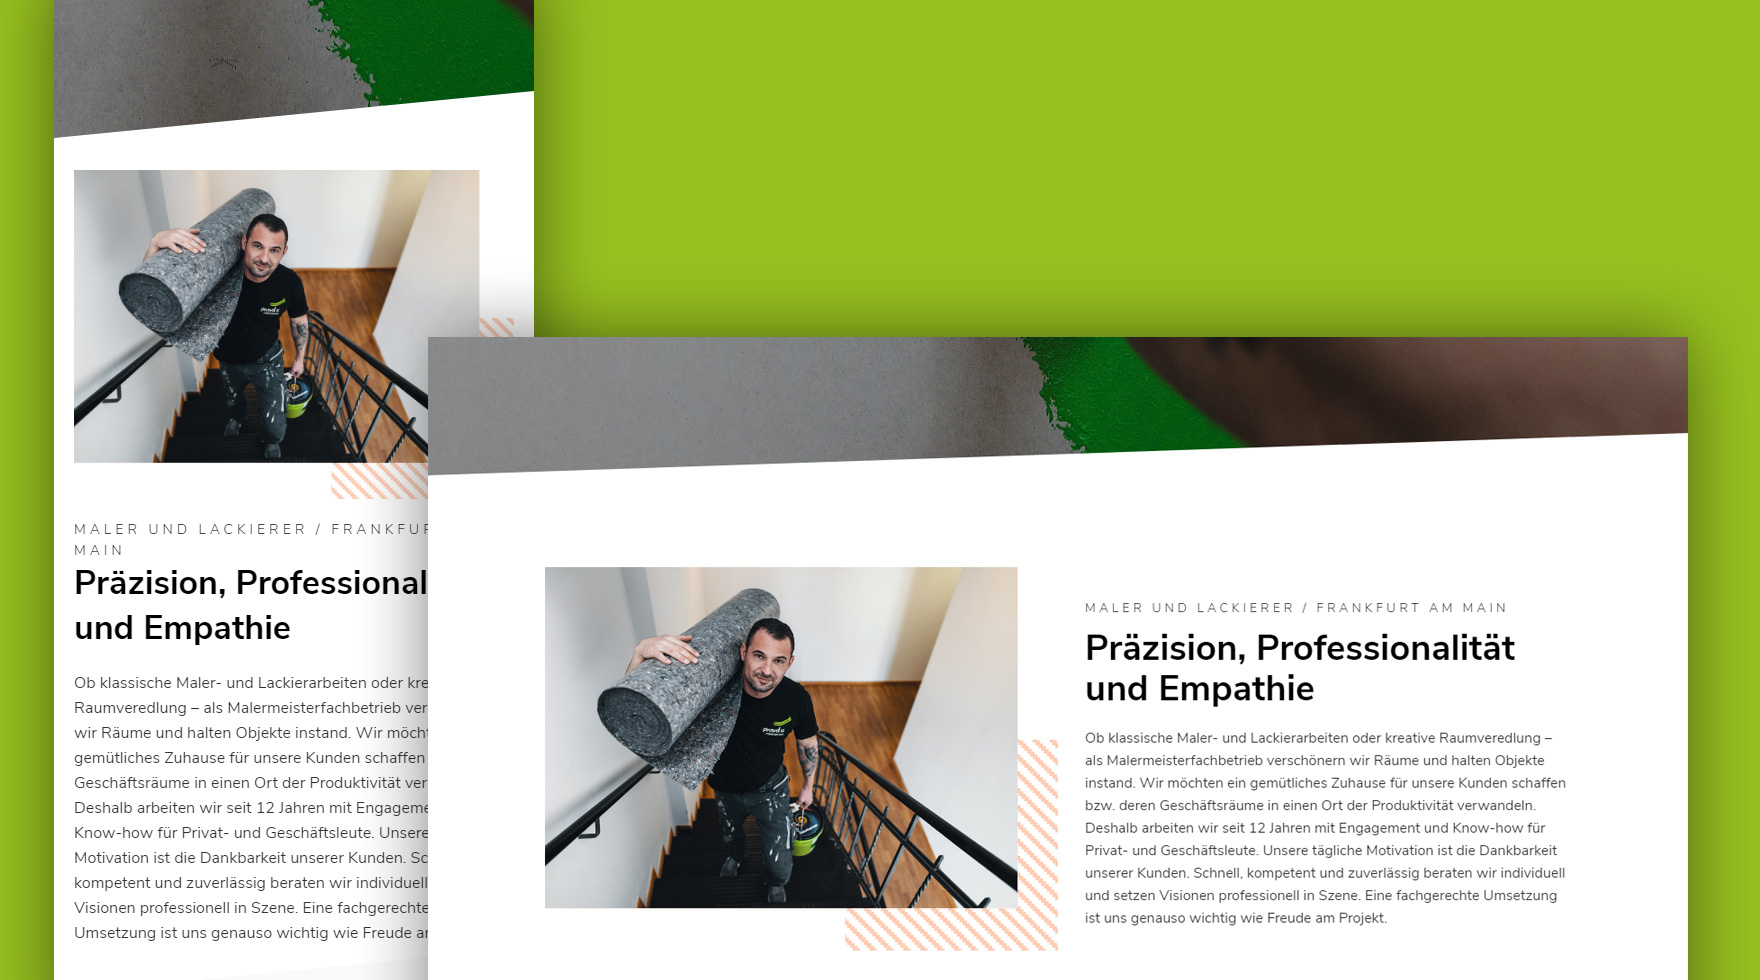 web-design-development-pravdic-frankfurt-agentur